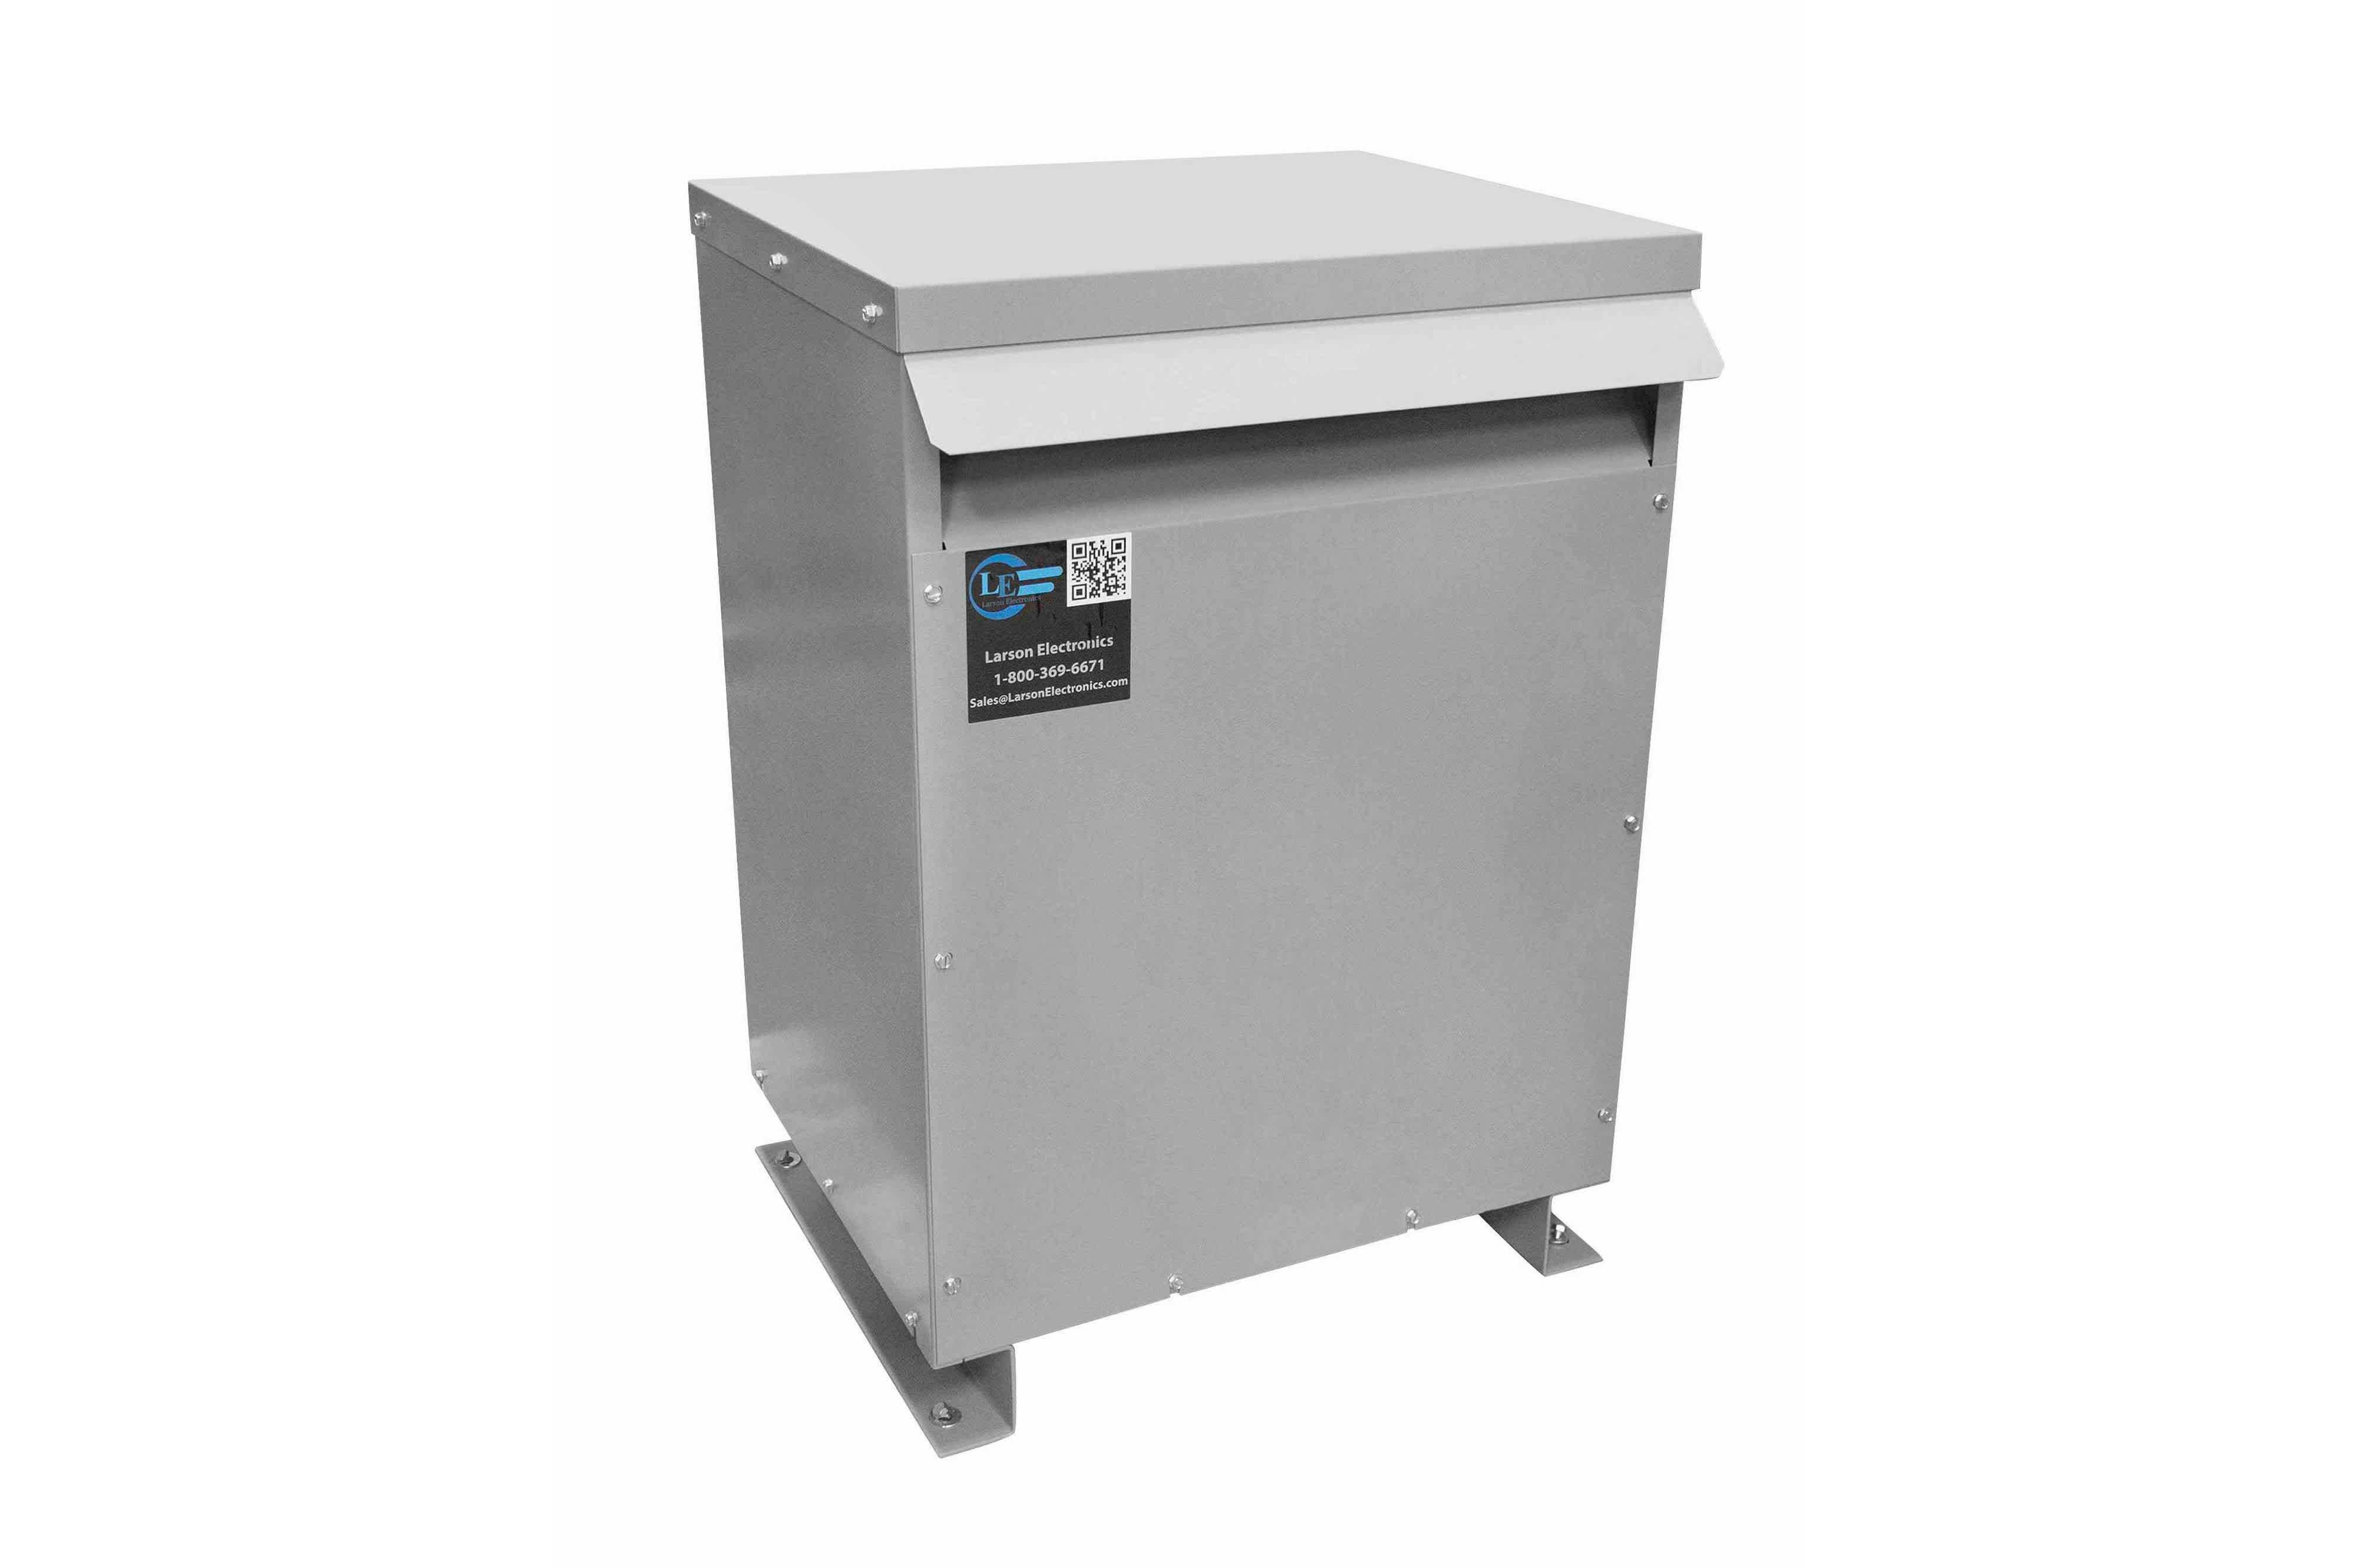 80 kVA 3PH Isolation Transformer, 600V Wye Primary, 480Y/277 Wye-N Secondary, N3R, Ventilated, 60 Hz